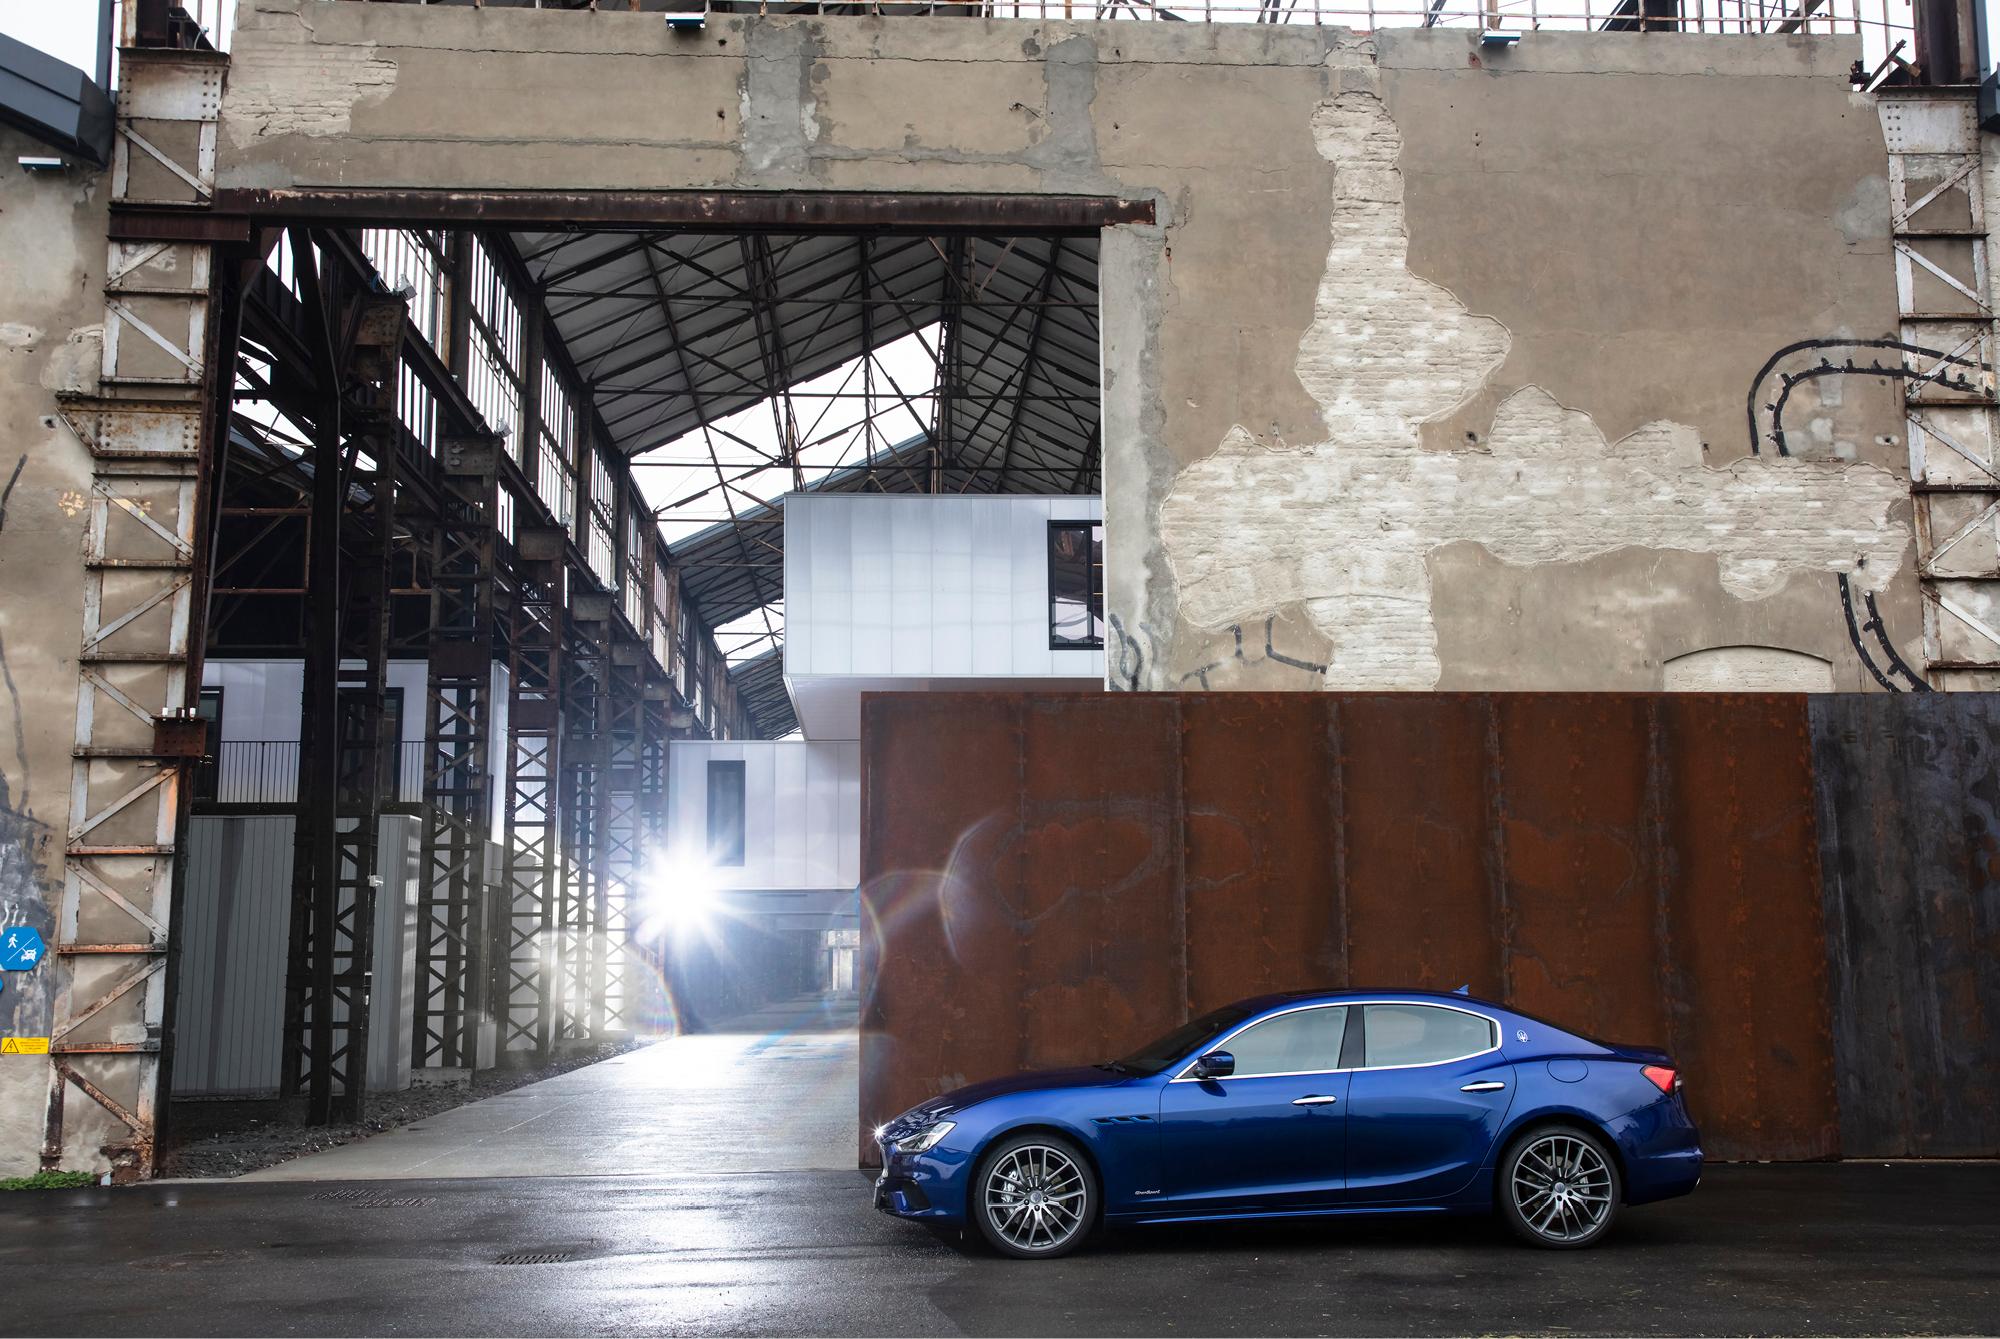 The Maserati Ghibli Hybrid